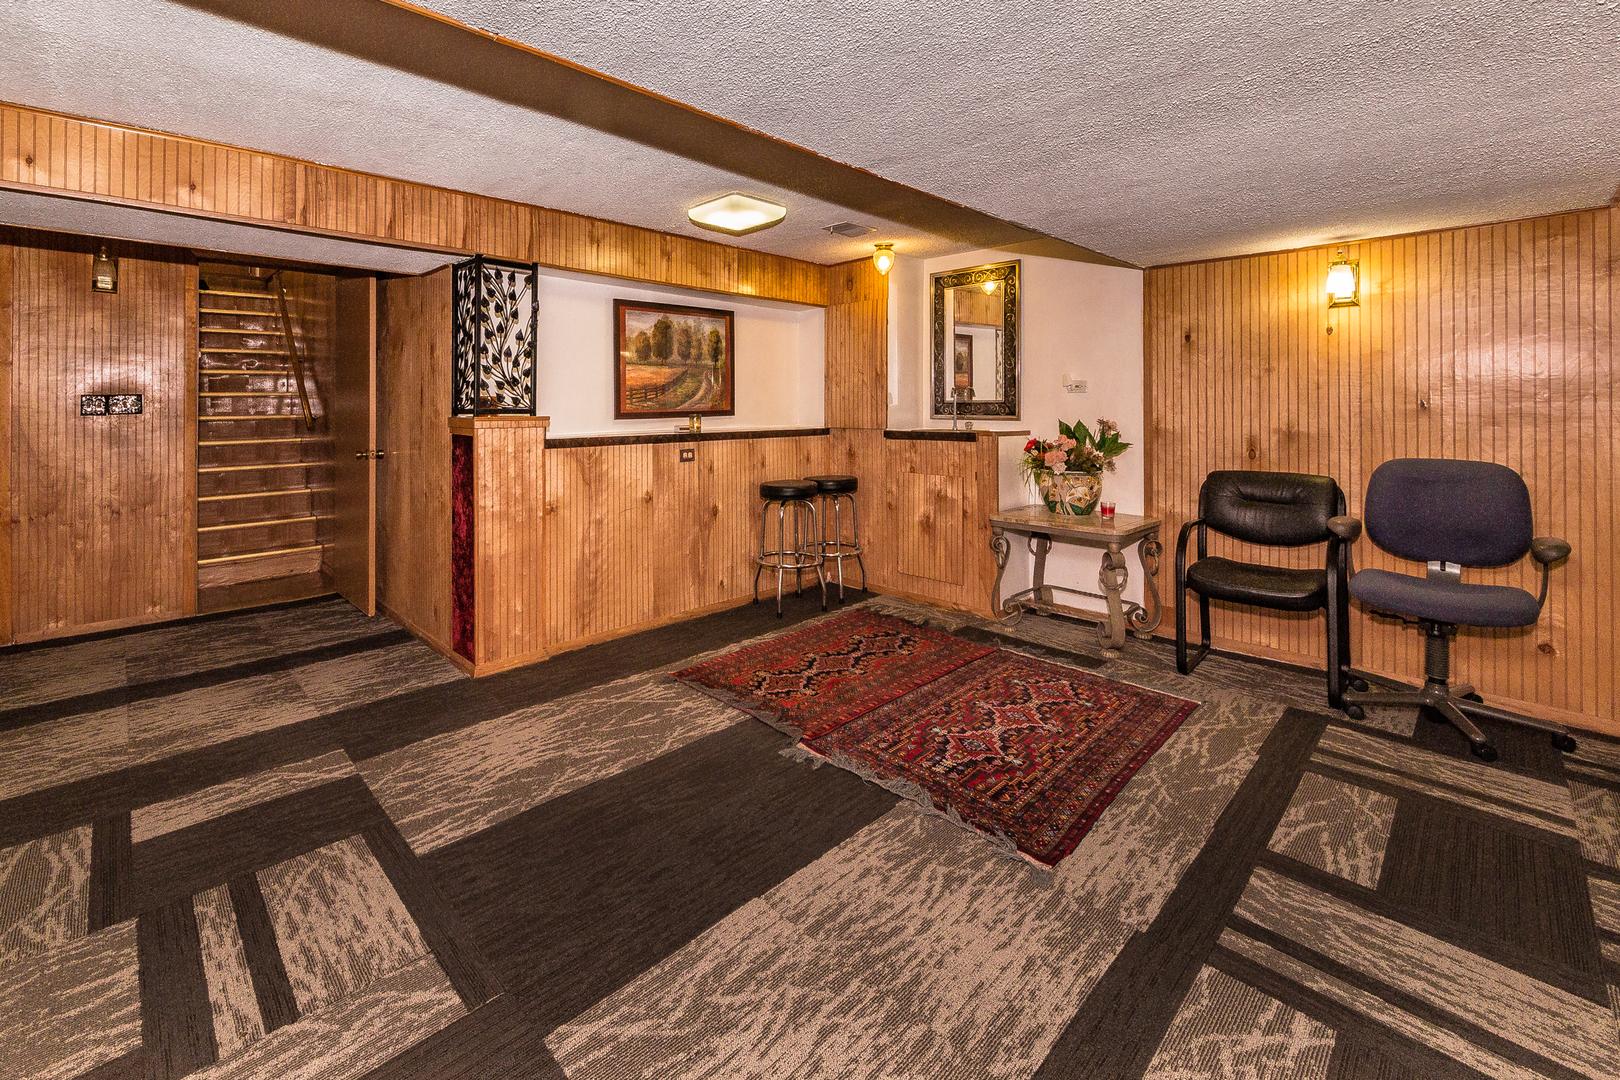 1014 West Eva, Mount Prospect, Illinois, 60056